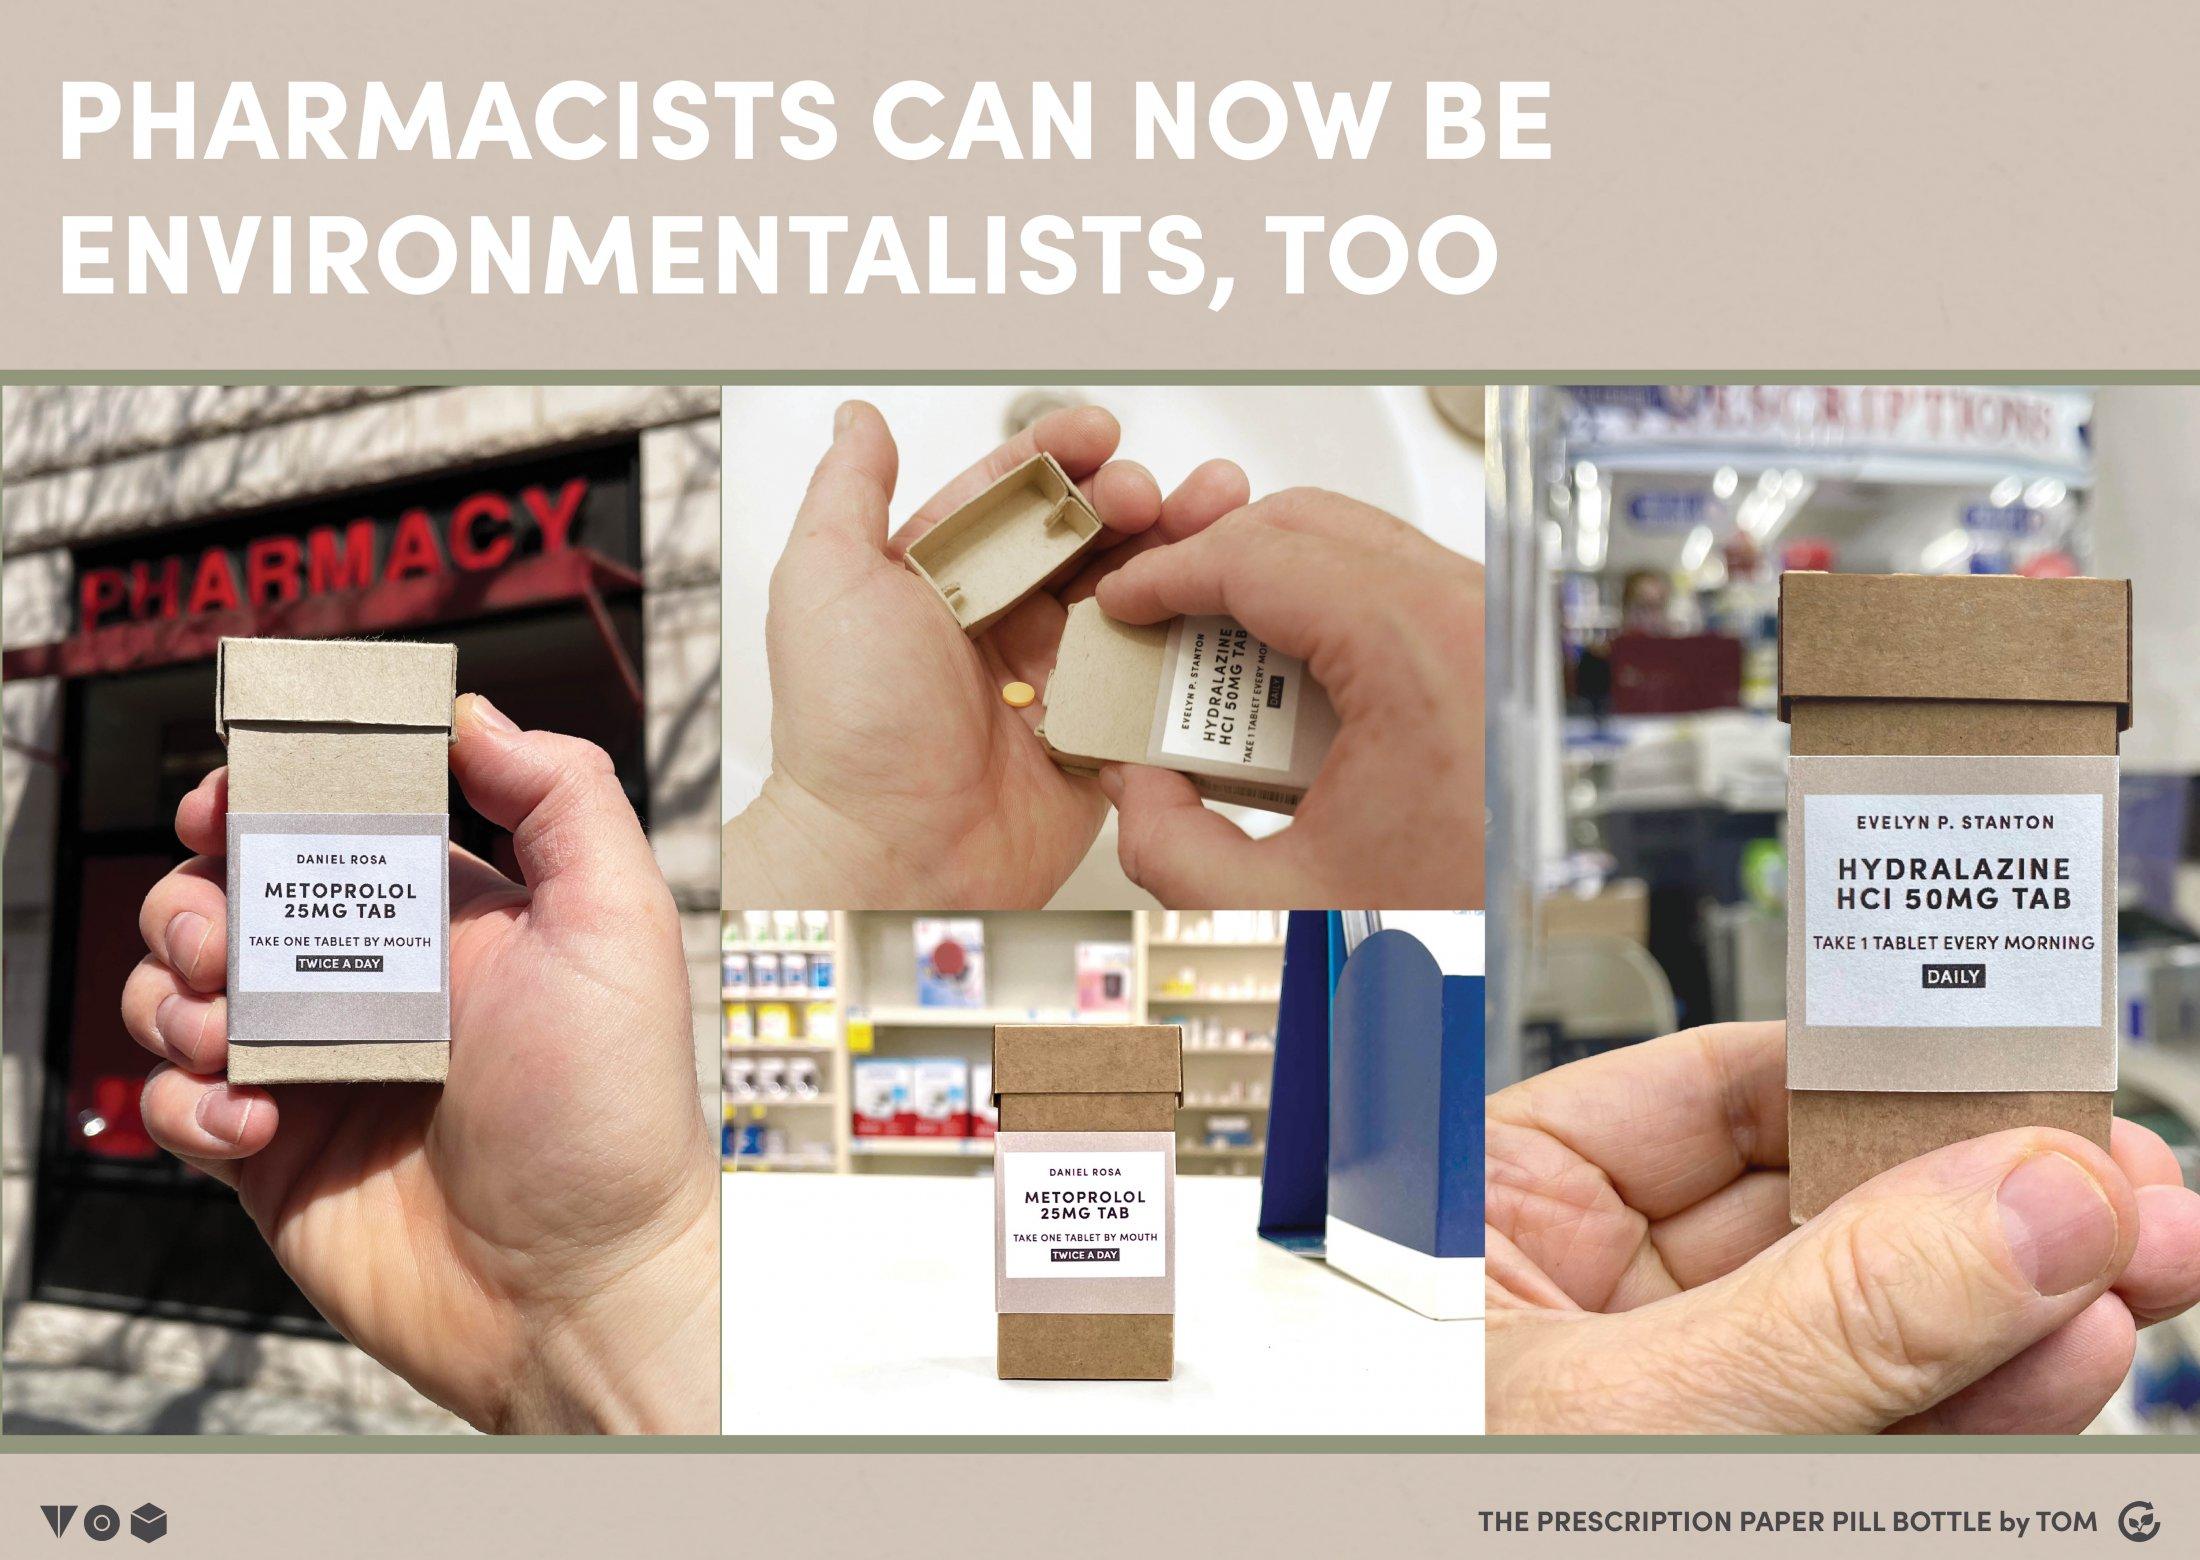 Thumbnail for The Prescription Paper Pill Bottle